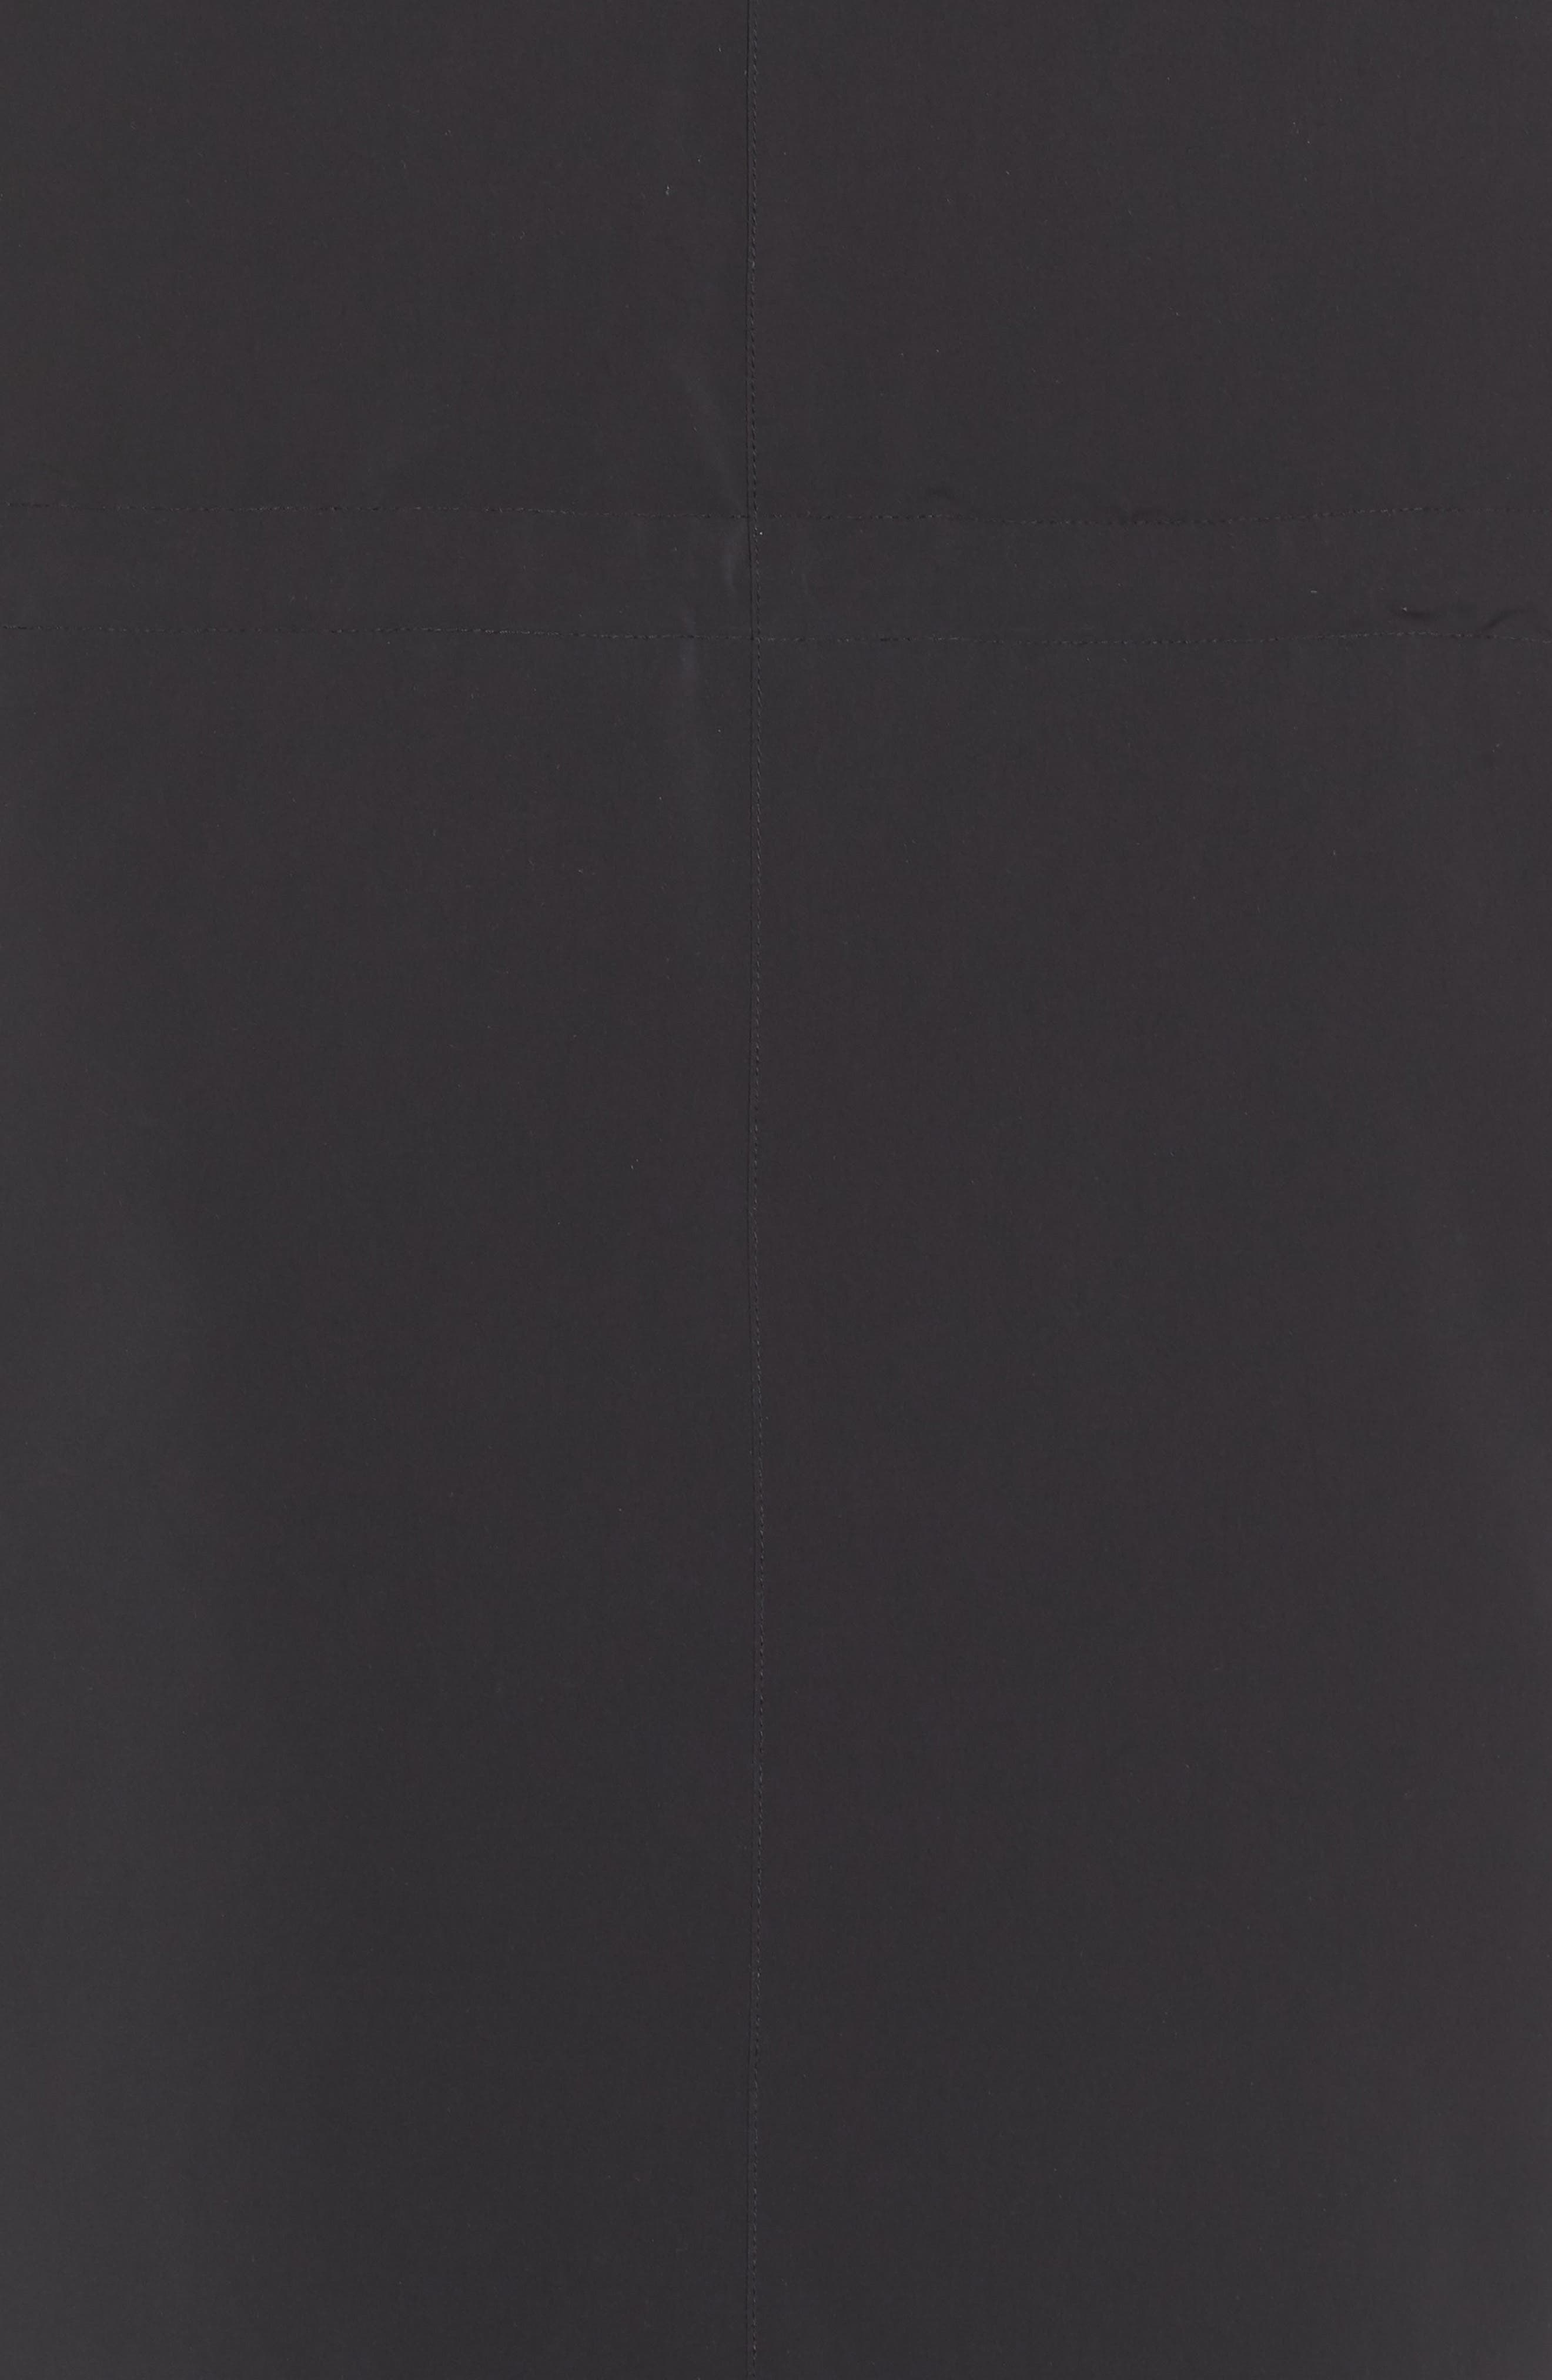 Sportswear Tech Pack Women's Down Fill Parka,                             Alternate thumbnail 8, color,                             BLACK/ NEWSPRINT/ BLACK